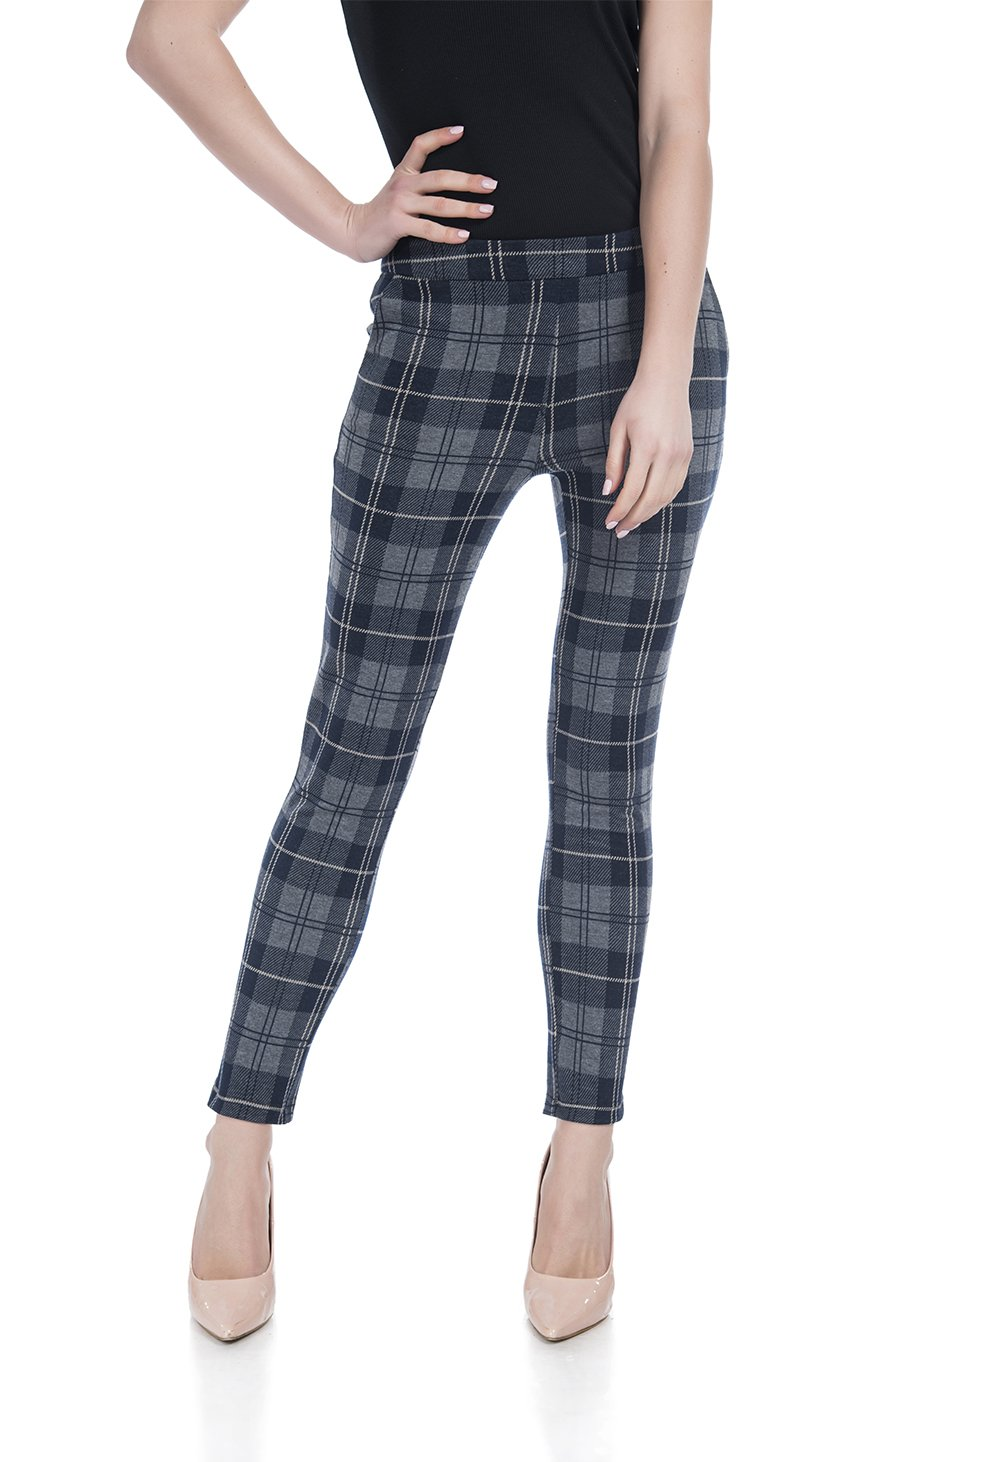 Soshow Plaid Pants for Women,Ultra Soft Leggings,Womens High Waist Slim Fit Pants